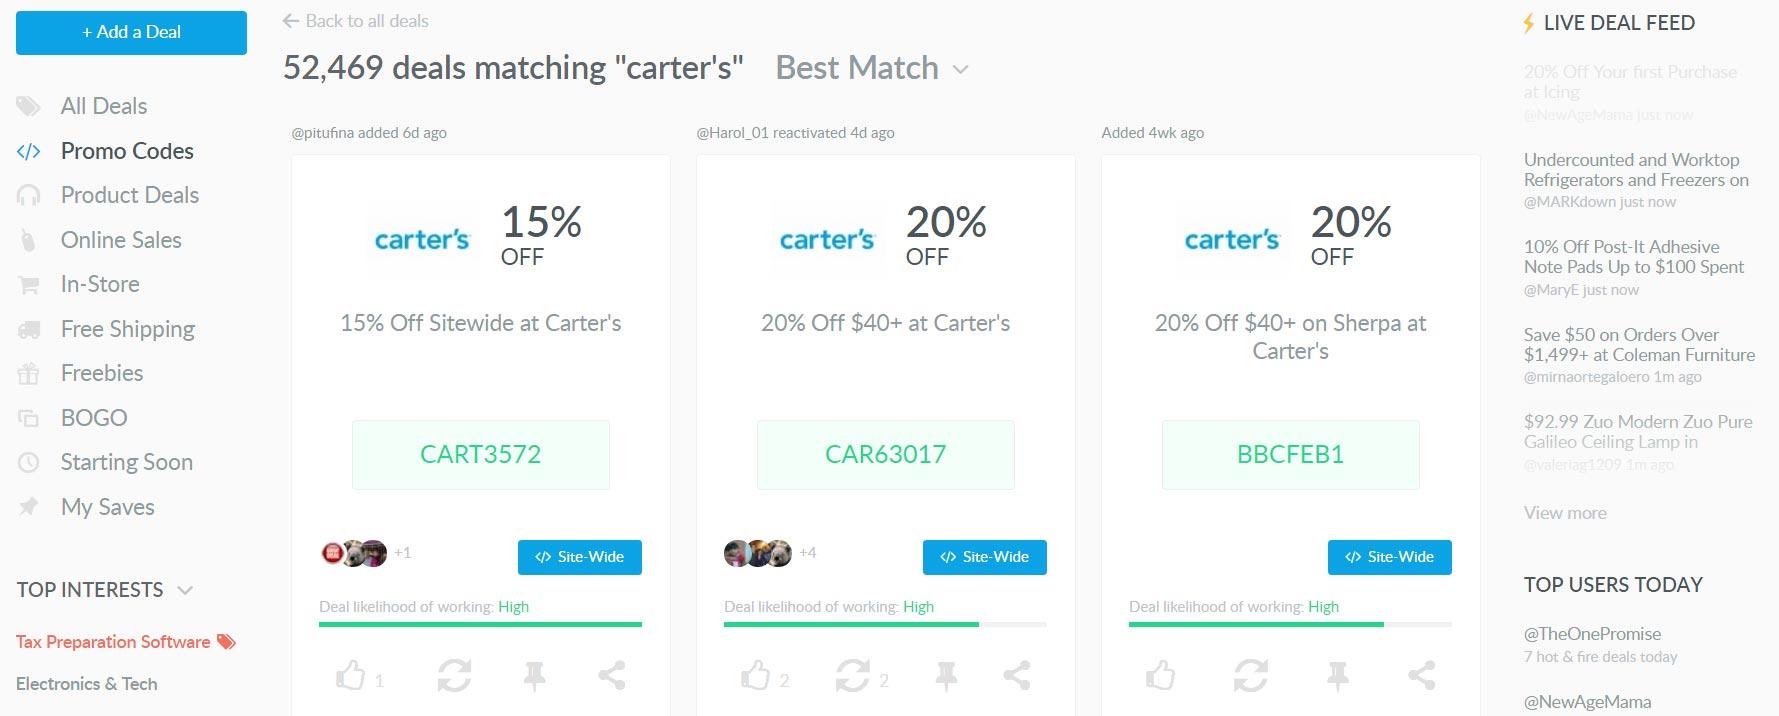 Carters promo code example on Dealspotr